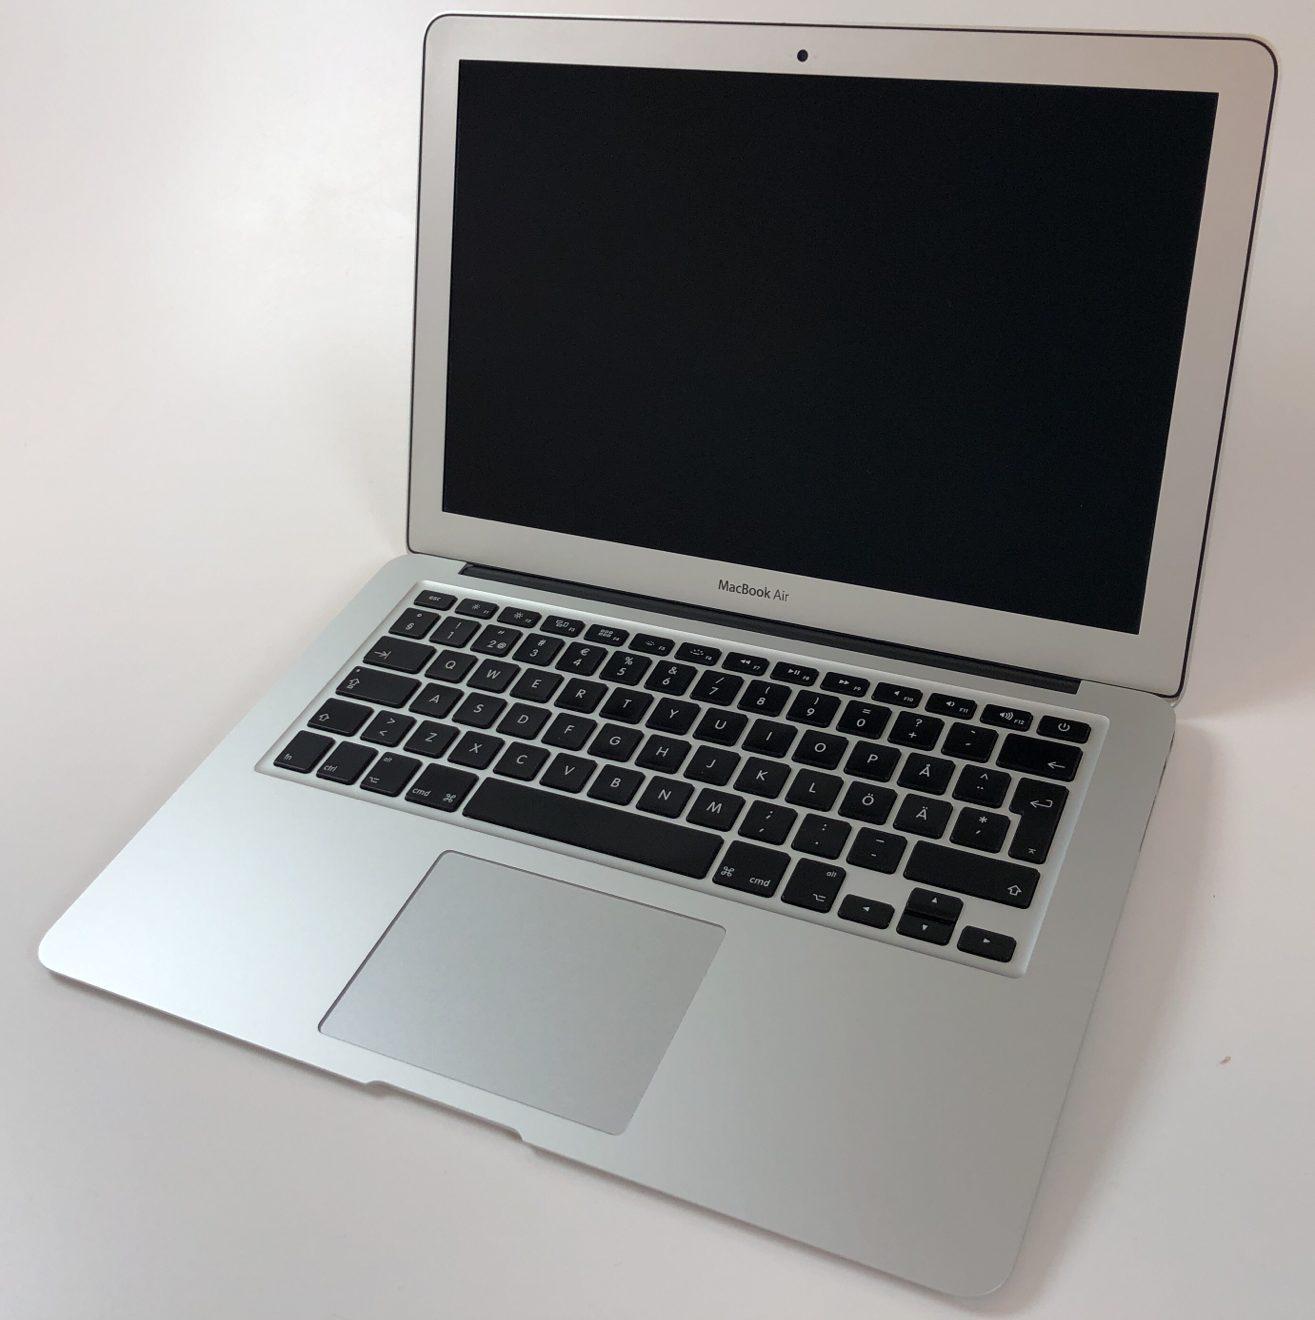 "MacBook Air 13"" Early 2014 (Intel Core i5 1.4 GHz 4 GB RAM 128 GB SSD), Intel Core i5 1.4 GHz, 4 GB RAM, 128 GB SSD, bild 1"